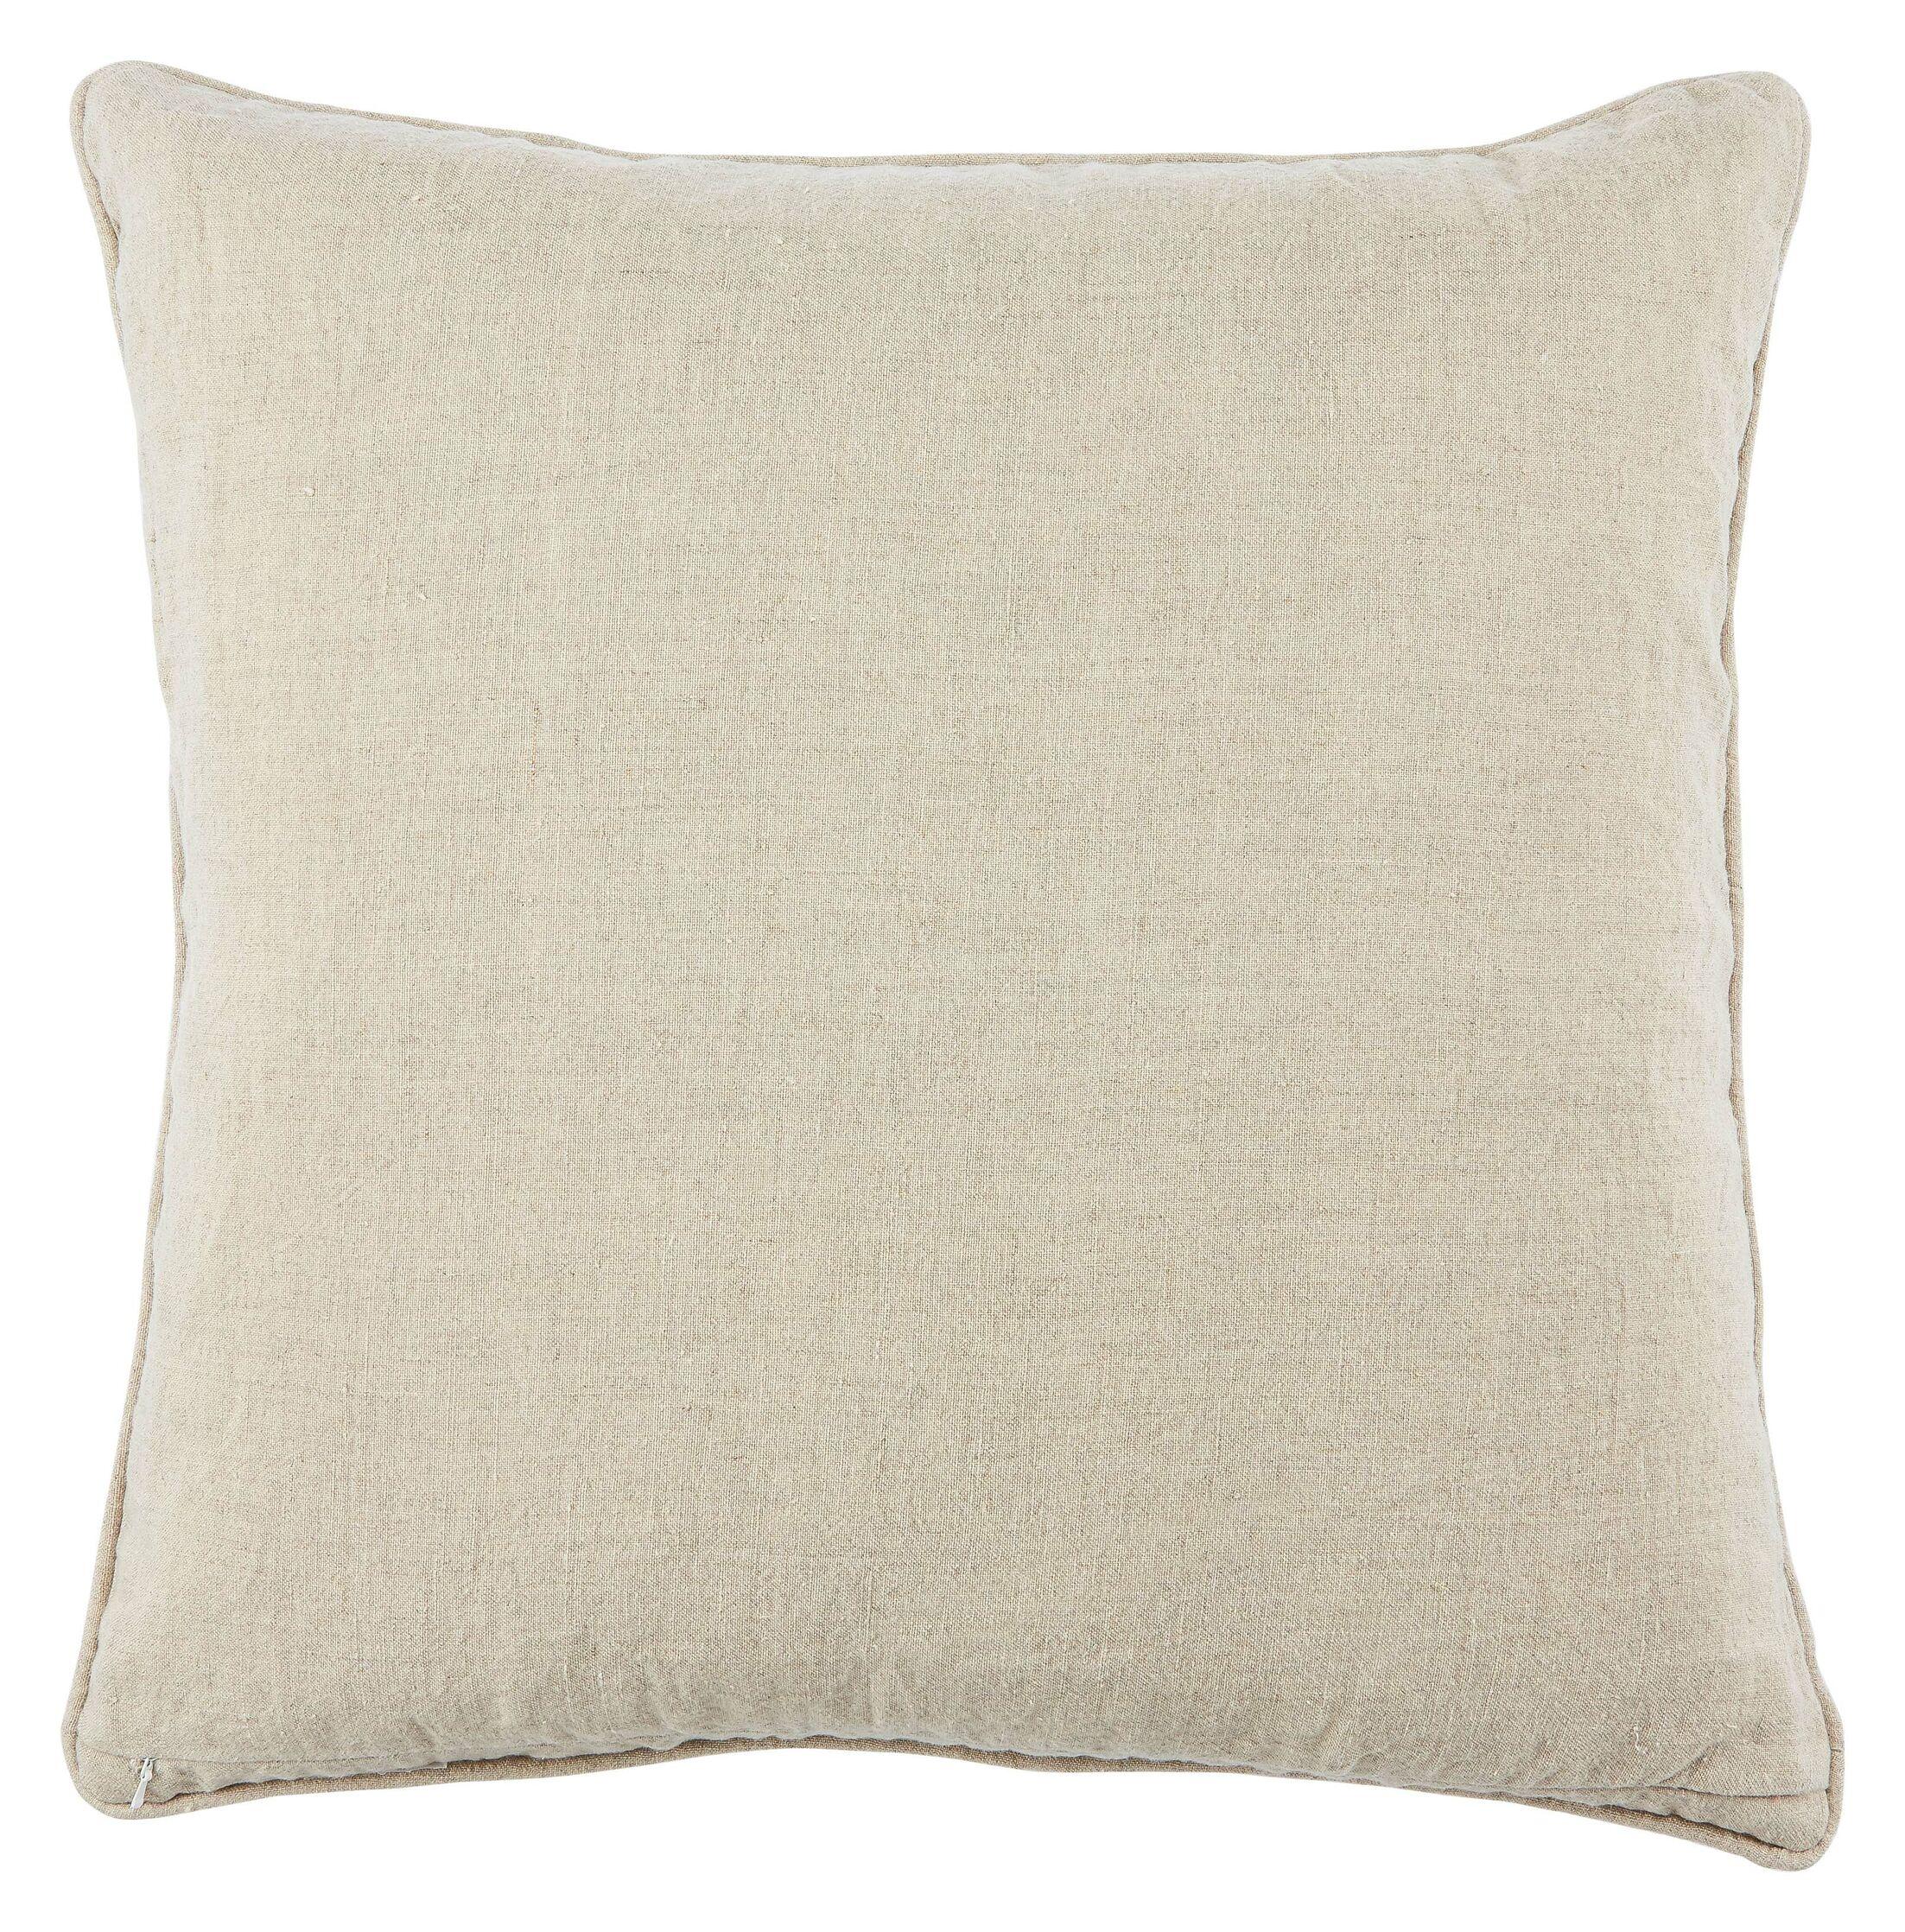 Tadashi Linen Throw Pillow Fill Material: Polyester/Polyfill